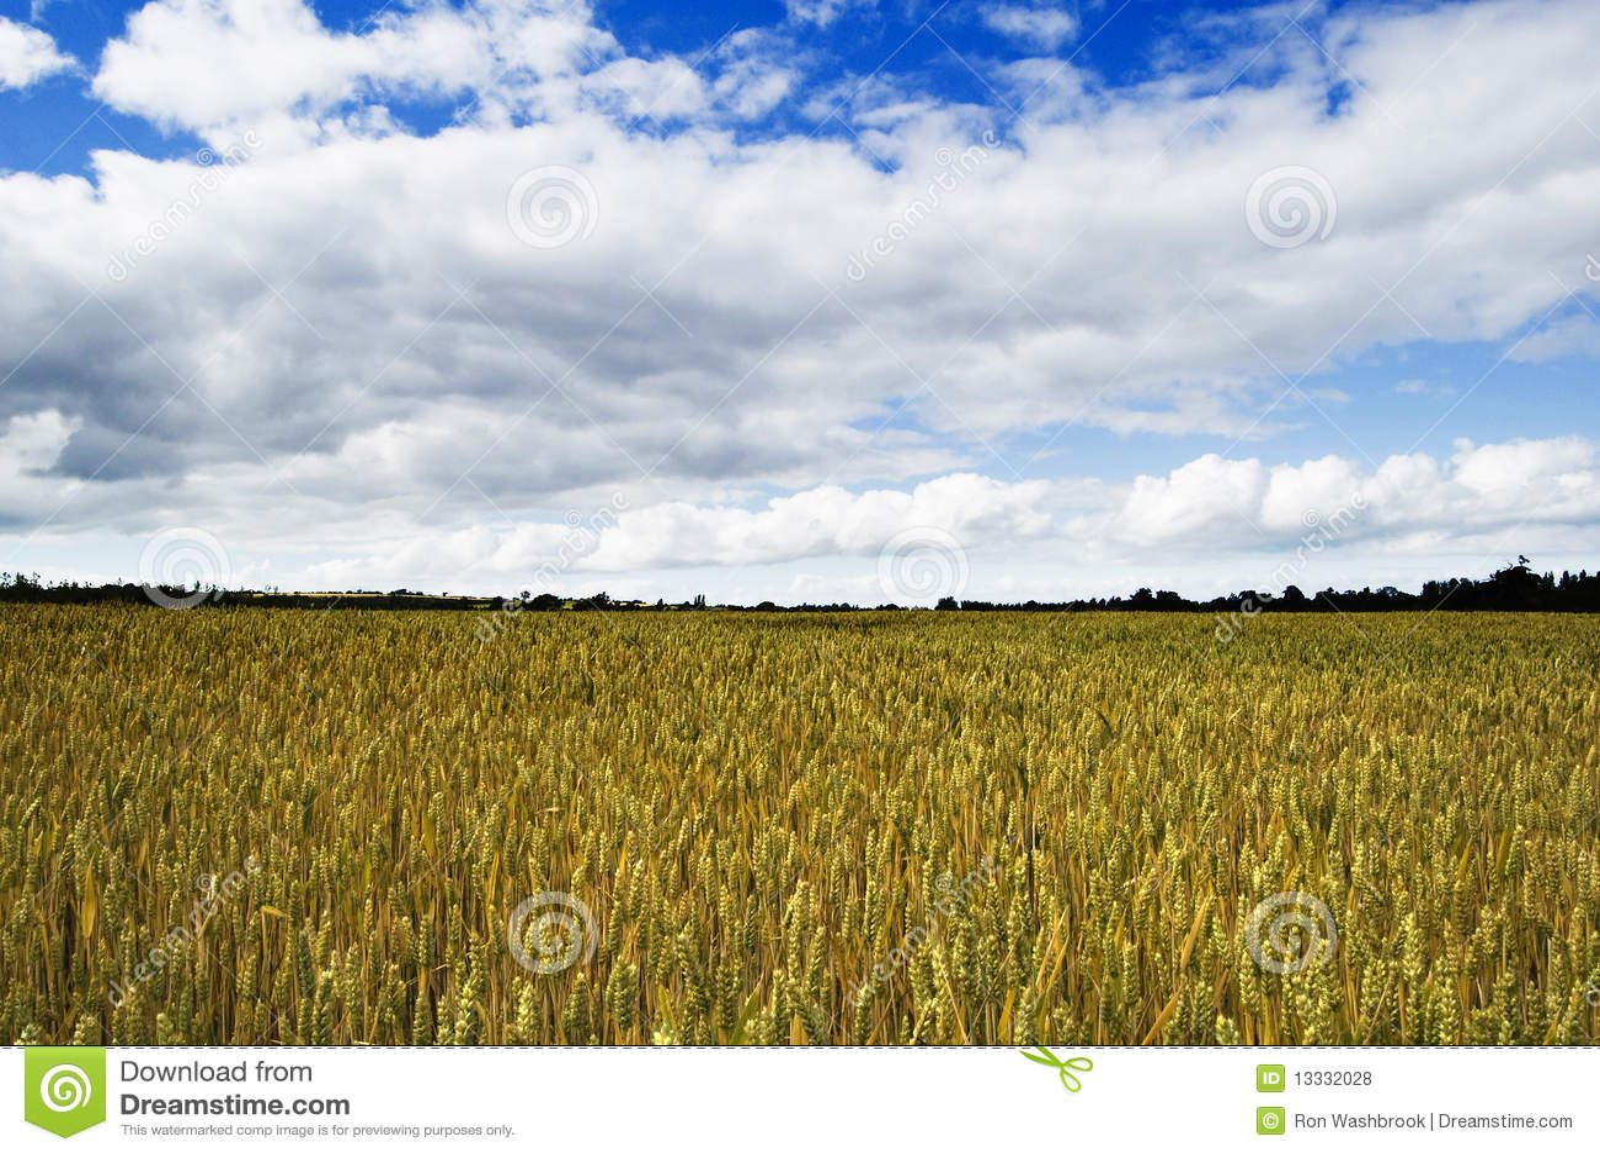 Shropshire Wheat Fields